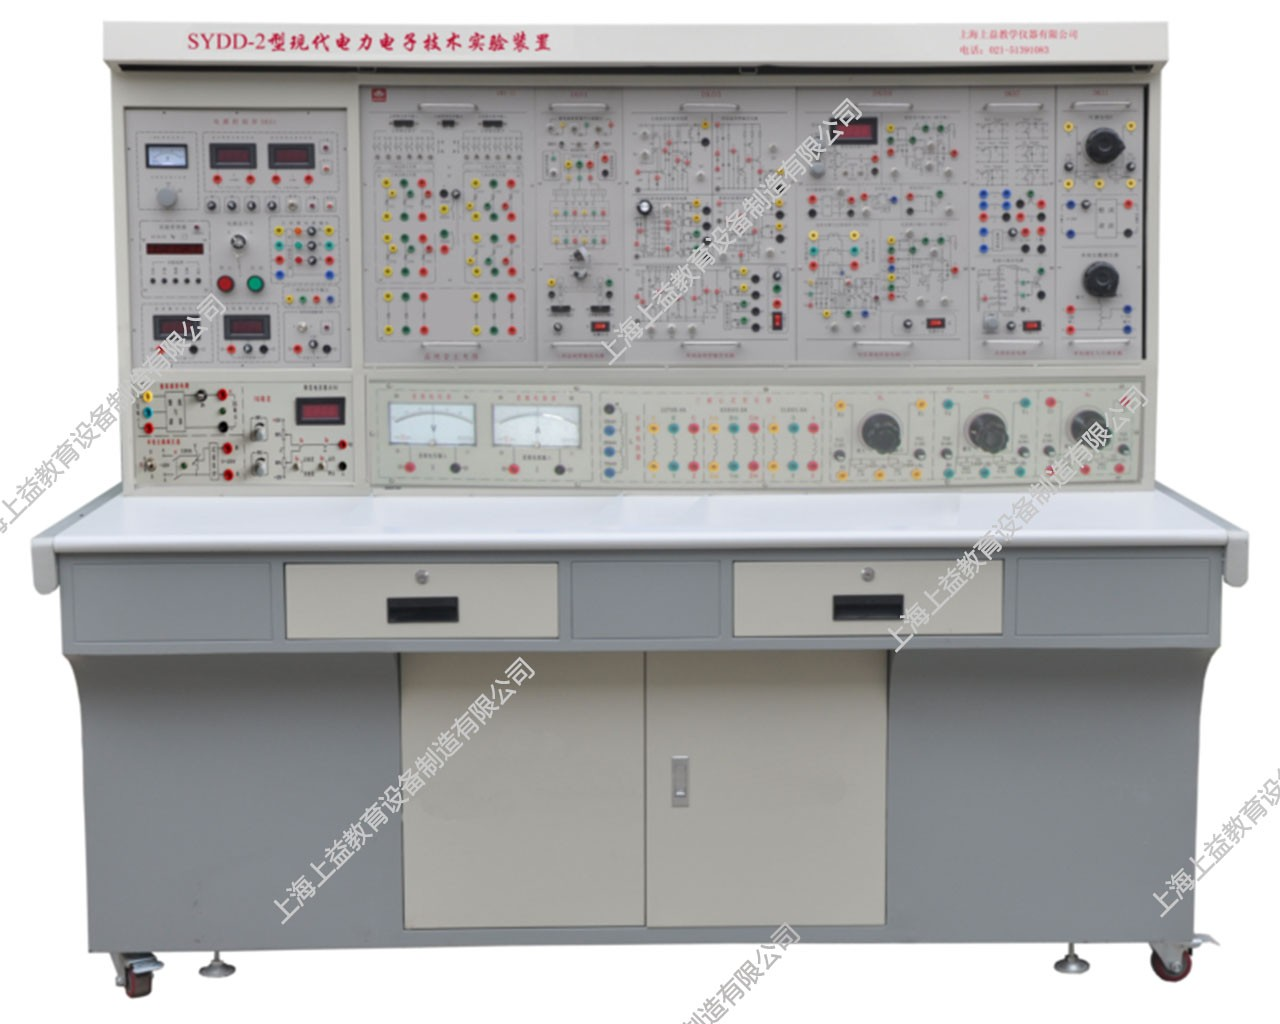 SYDD-2 现代电力电子技术实验装置